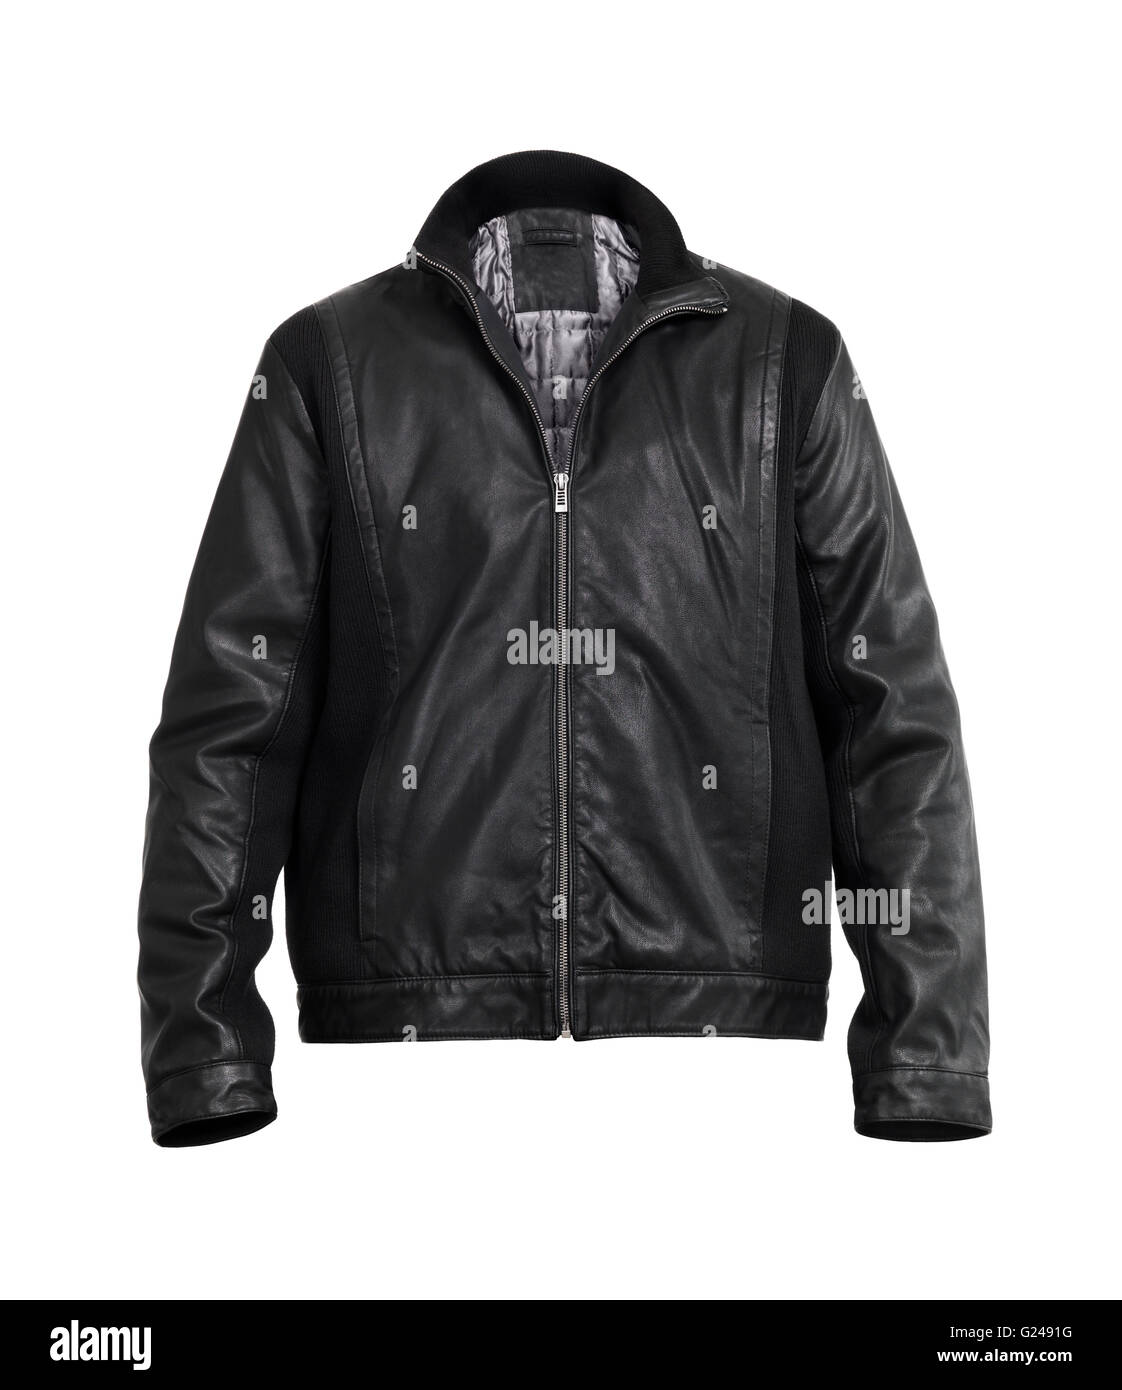 Black men's leather jacket - Stock Image